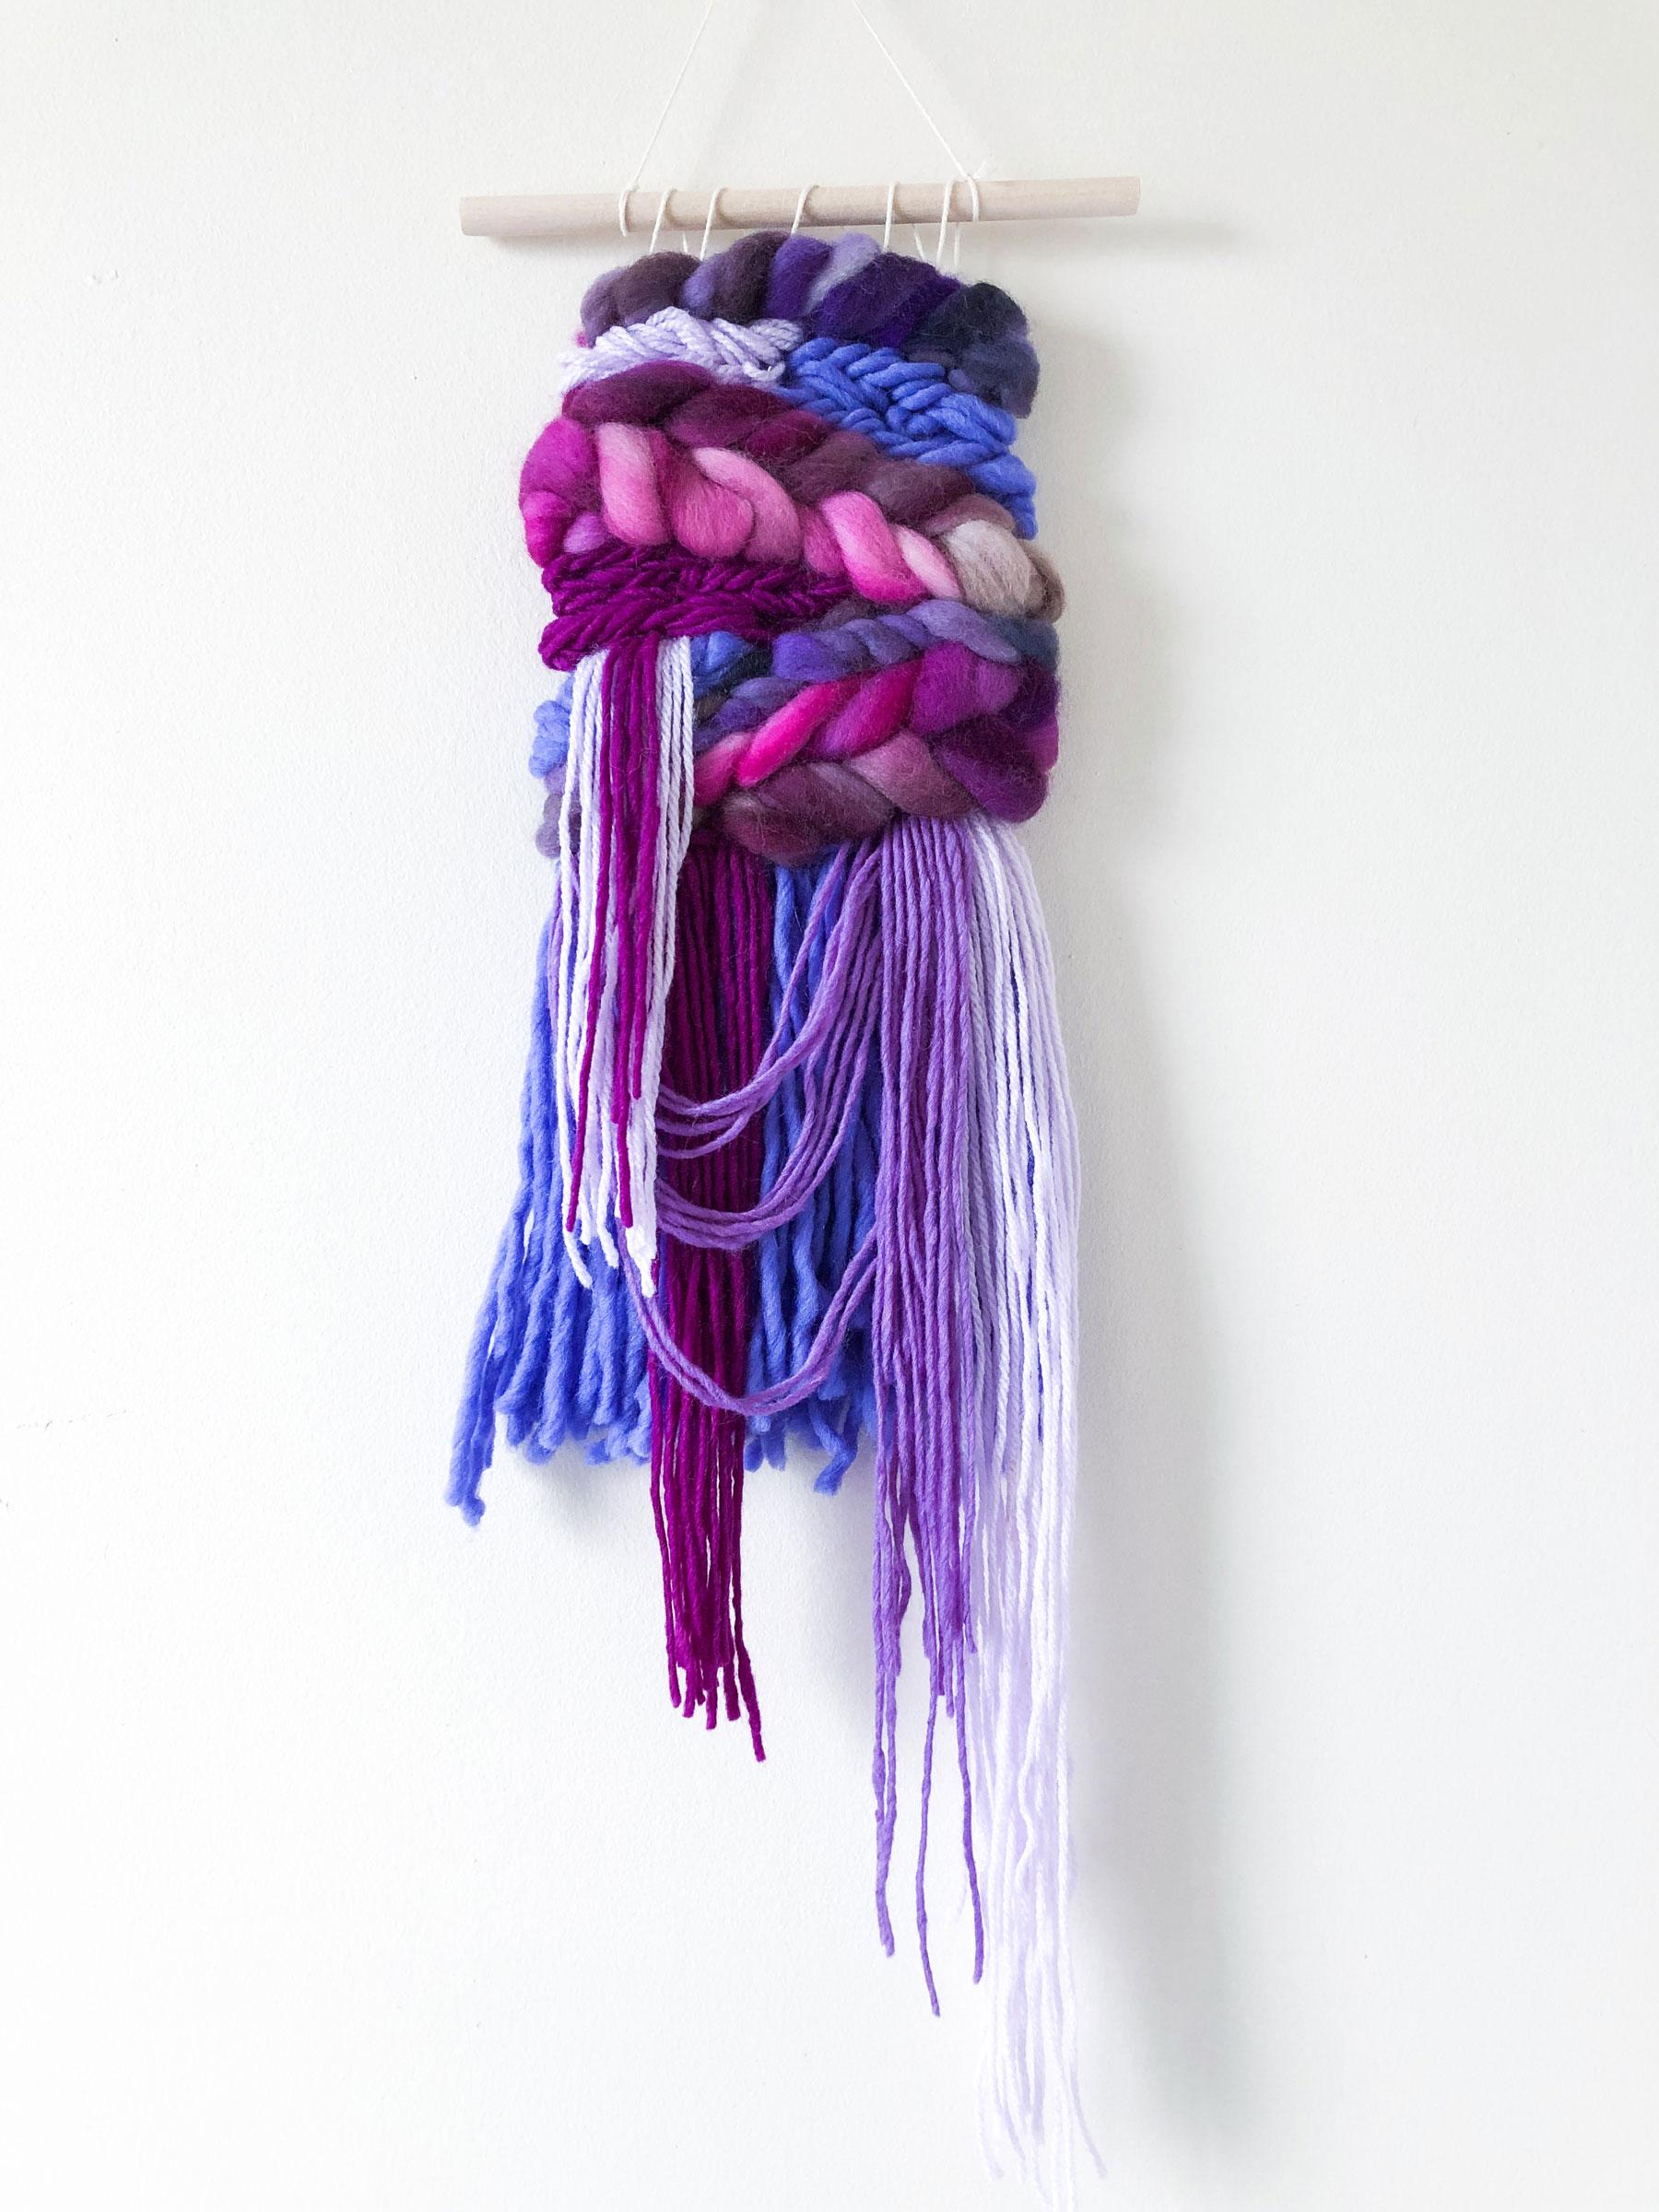 PurpleMini_BrynaShields_2.jpg